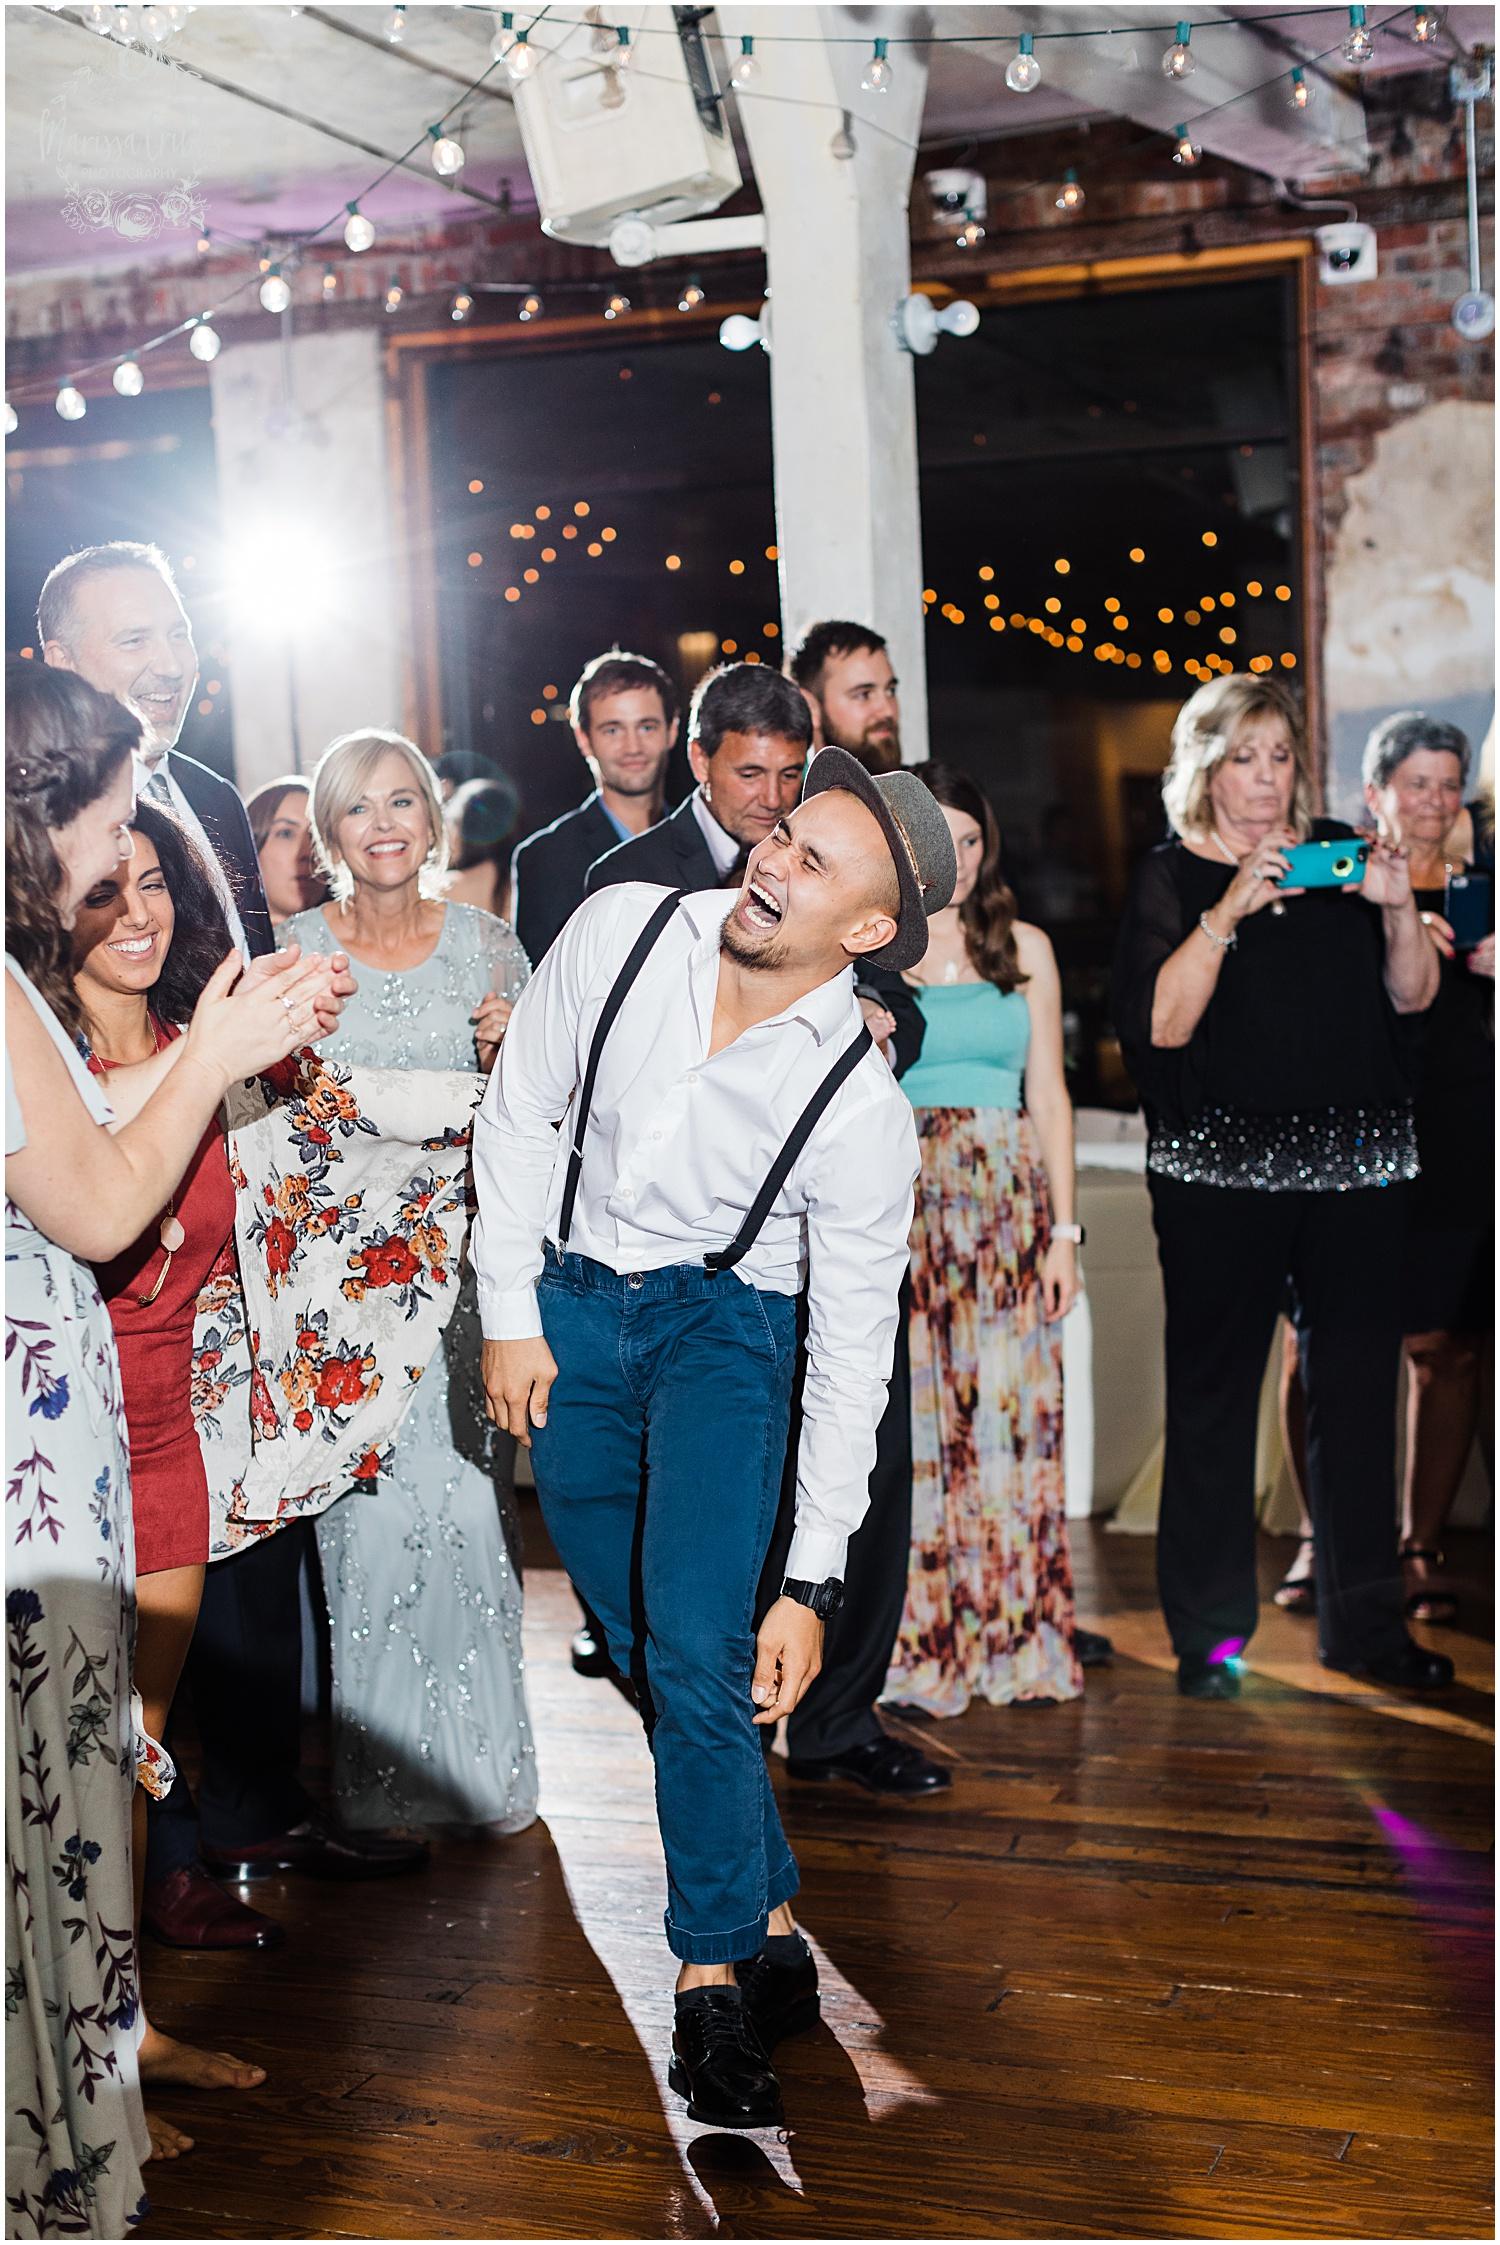 BAUER WEDDING   KELSEA & JUSTIN   MARISSA CRIBBS PHOTOGRAPHY_6613.jpg